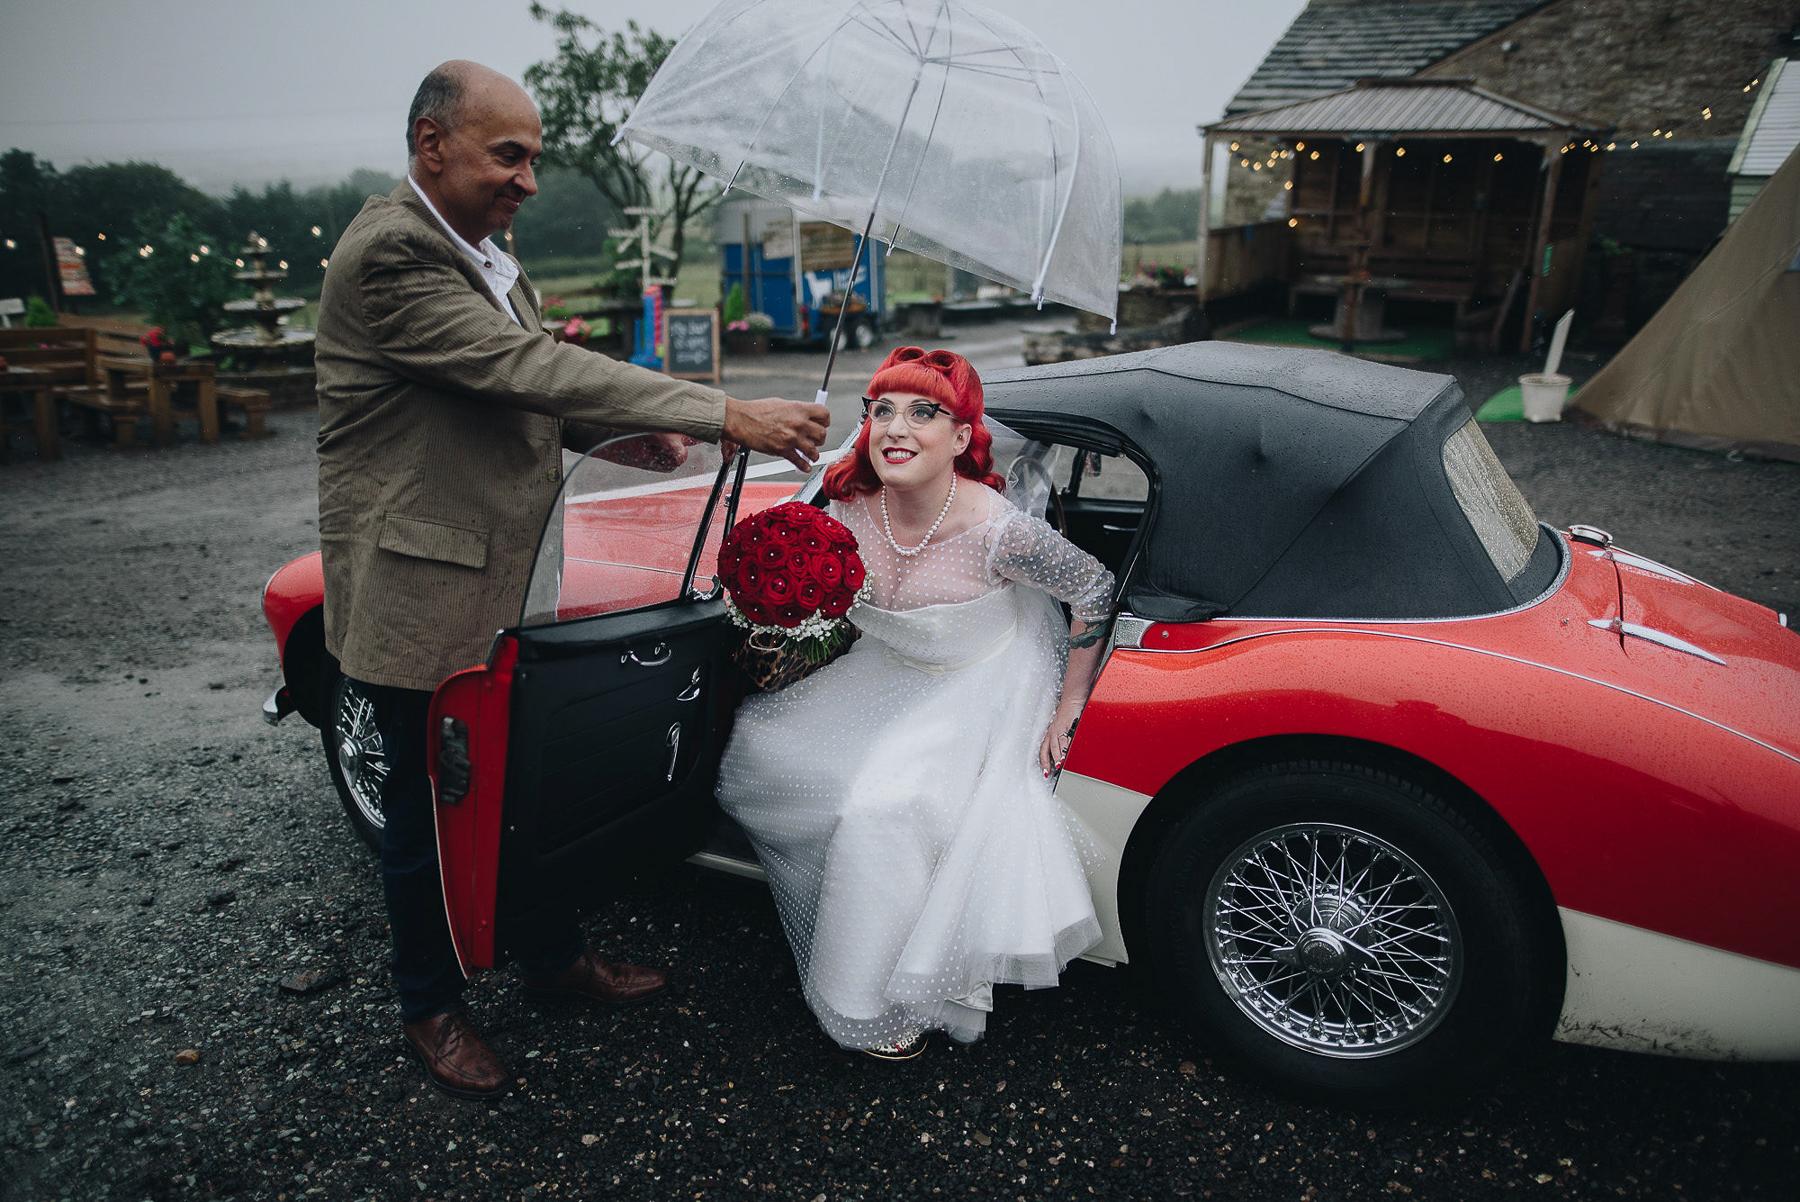 Wellbeing_Farm_Wedding_Photography_The_Pin-Up_Bride_Lara_Shaun-42.jpg